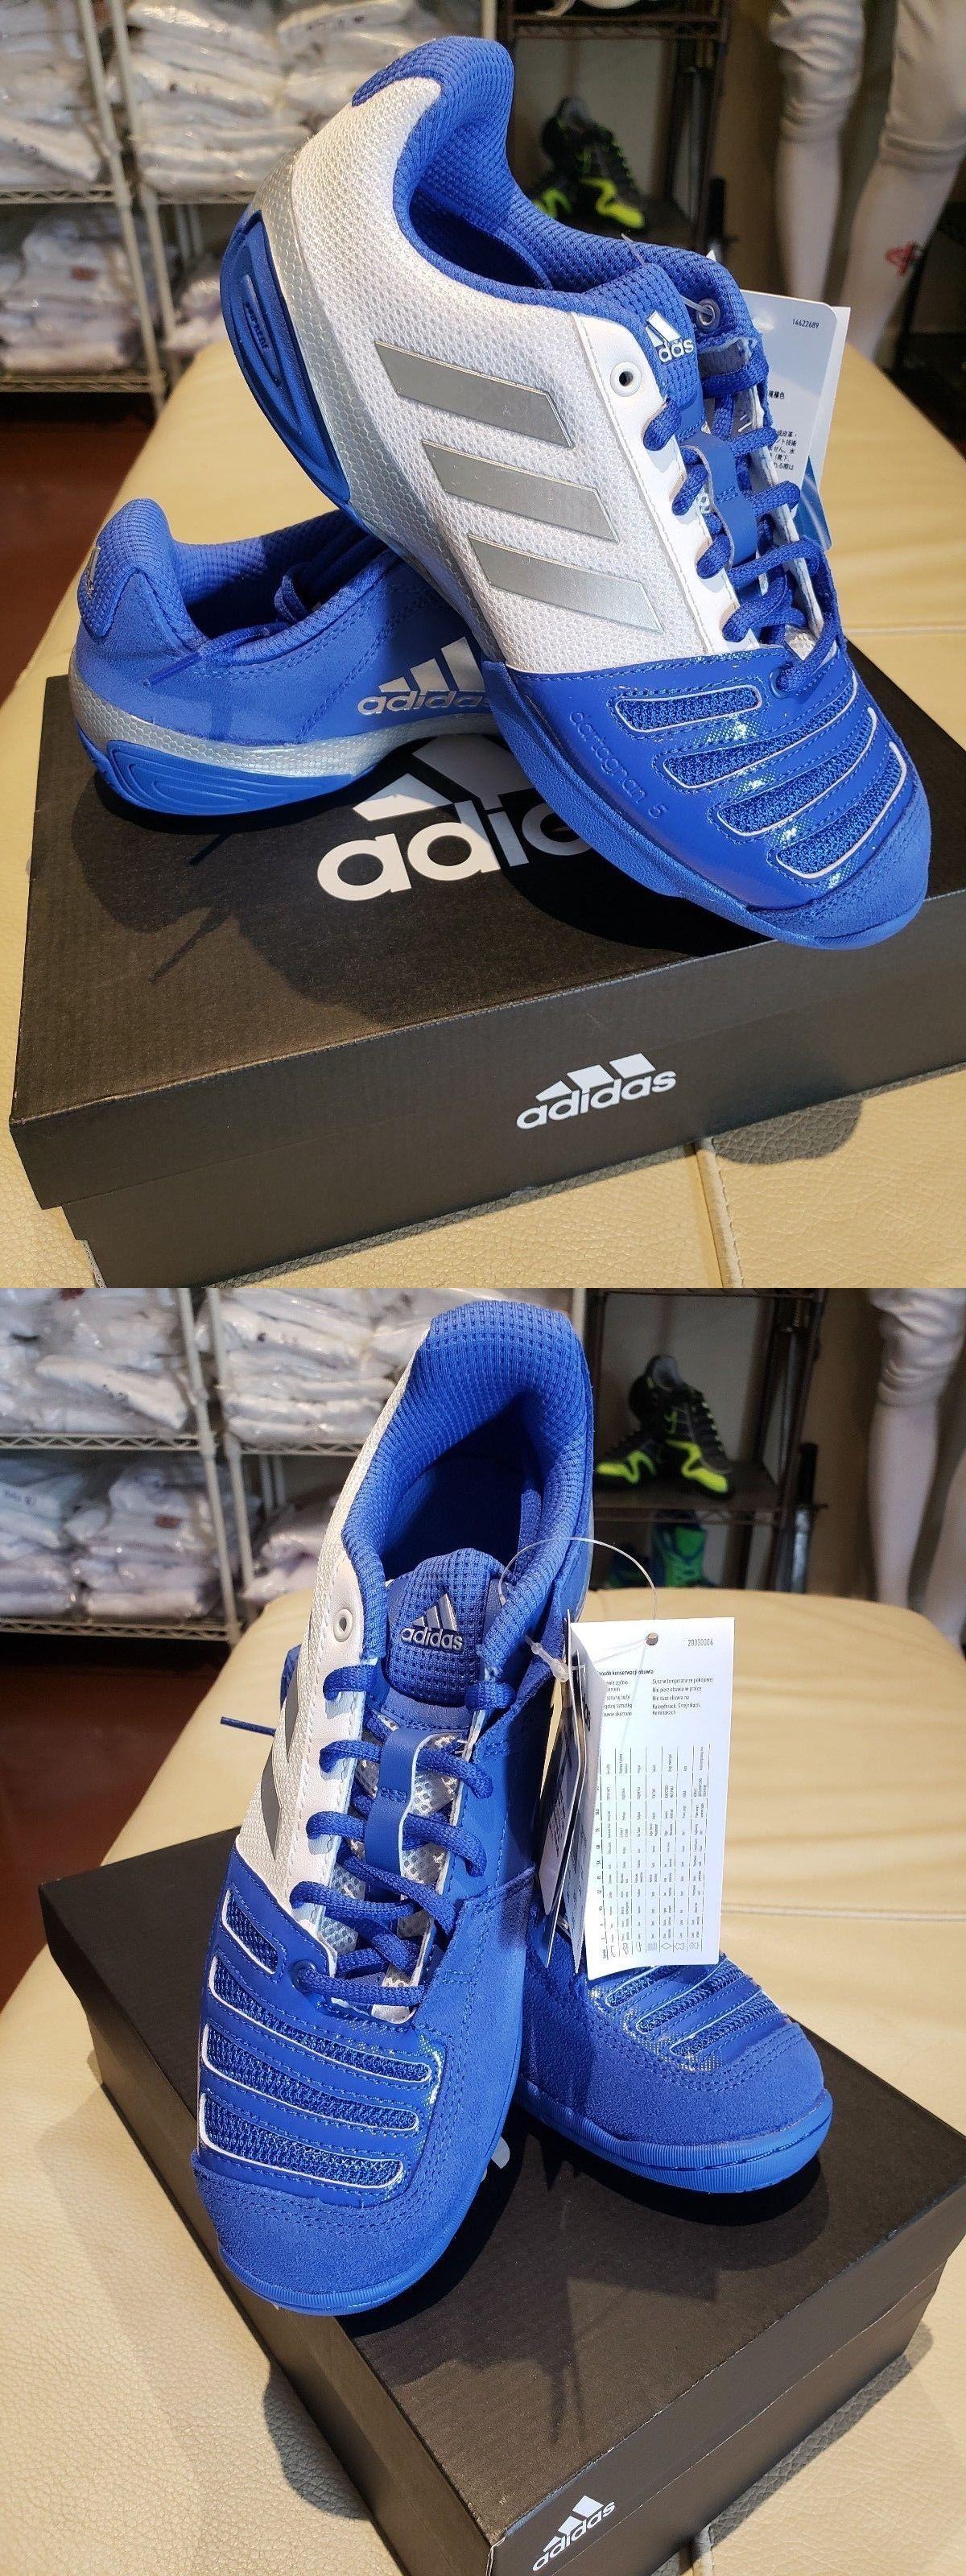 d390c341c86 Fencing 47322  Fencing Shoes - Adidas 2018 D Artagnan V Blue -  BUY IT NOW  ONLY   134.99 on eBay!